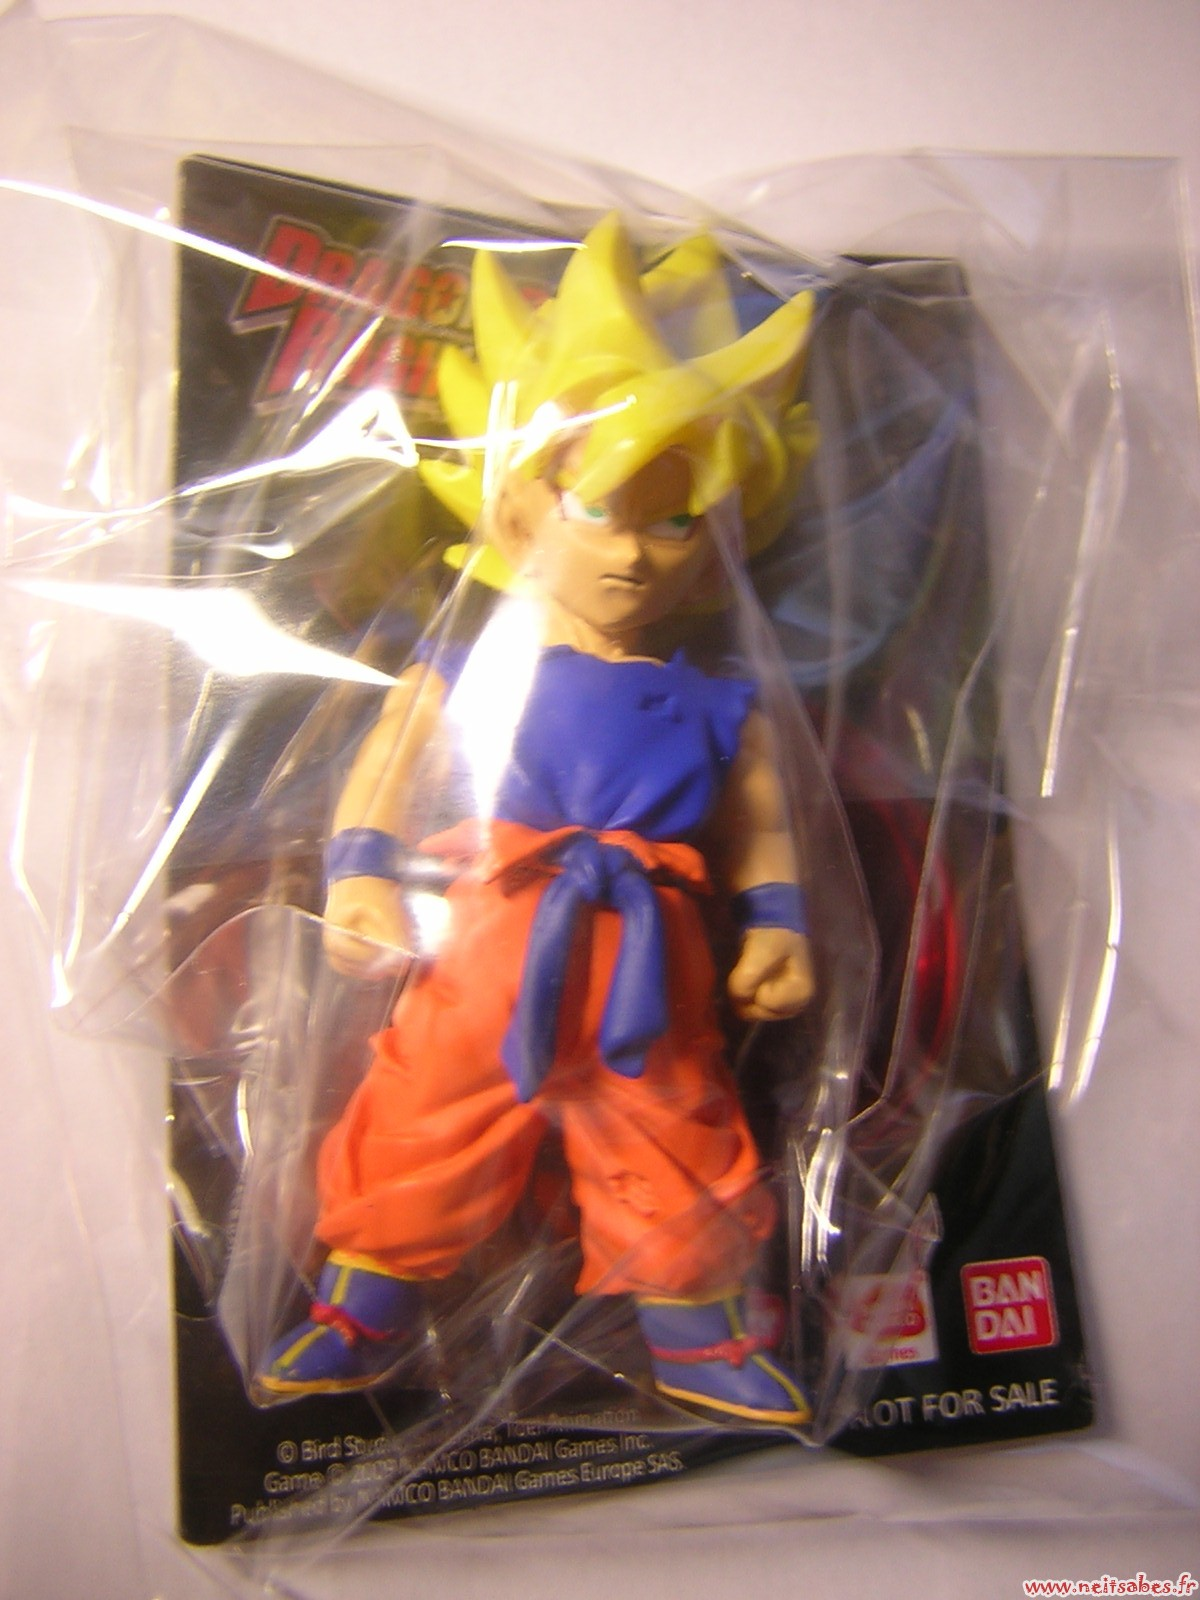 Concours- Une mini figurine Dragon Ball Z Raging Blast à gagner